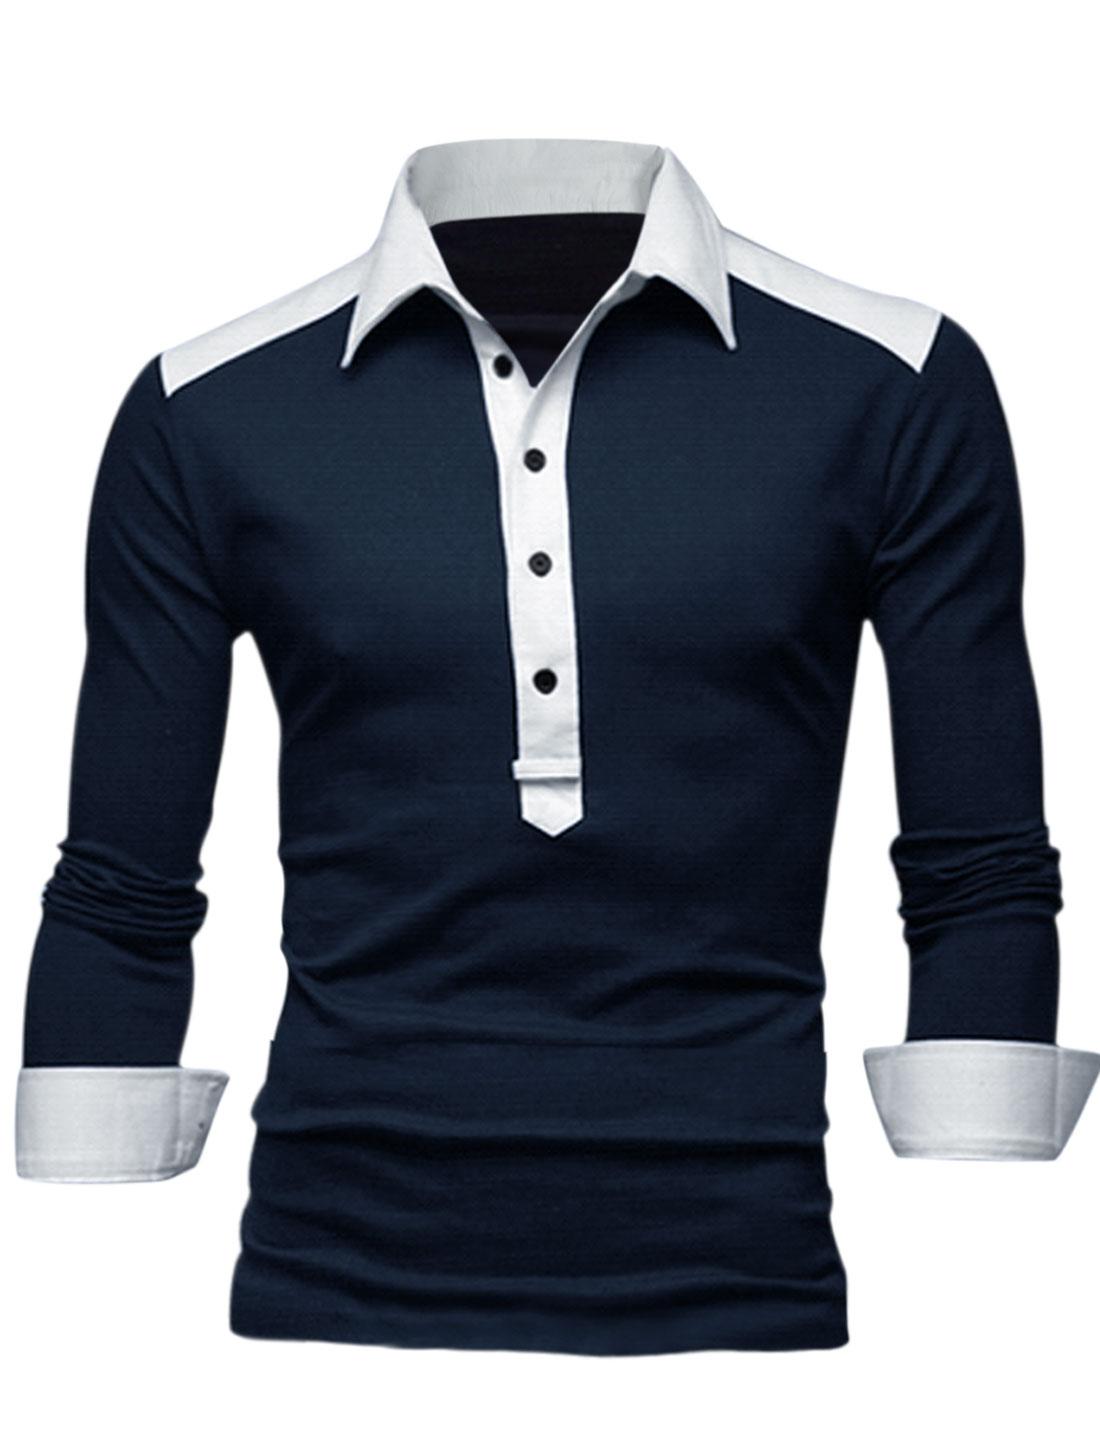 Men Point Collar 1/2 Placket Contrast Color Shoulder Casual Polo Shirt Navy Blue M